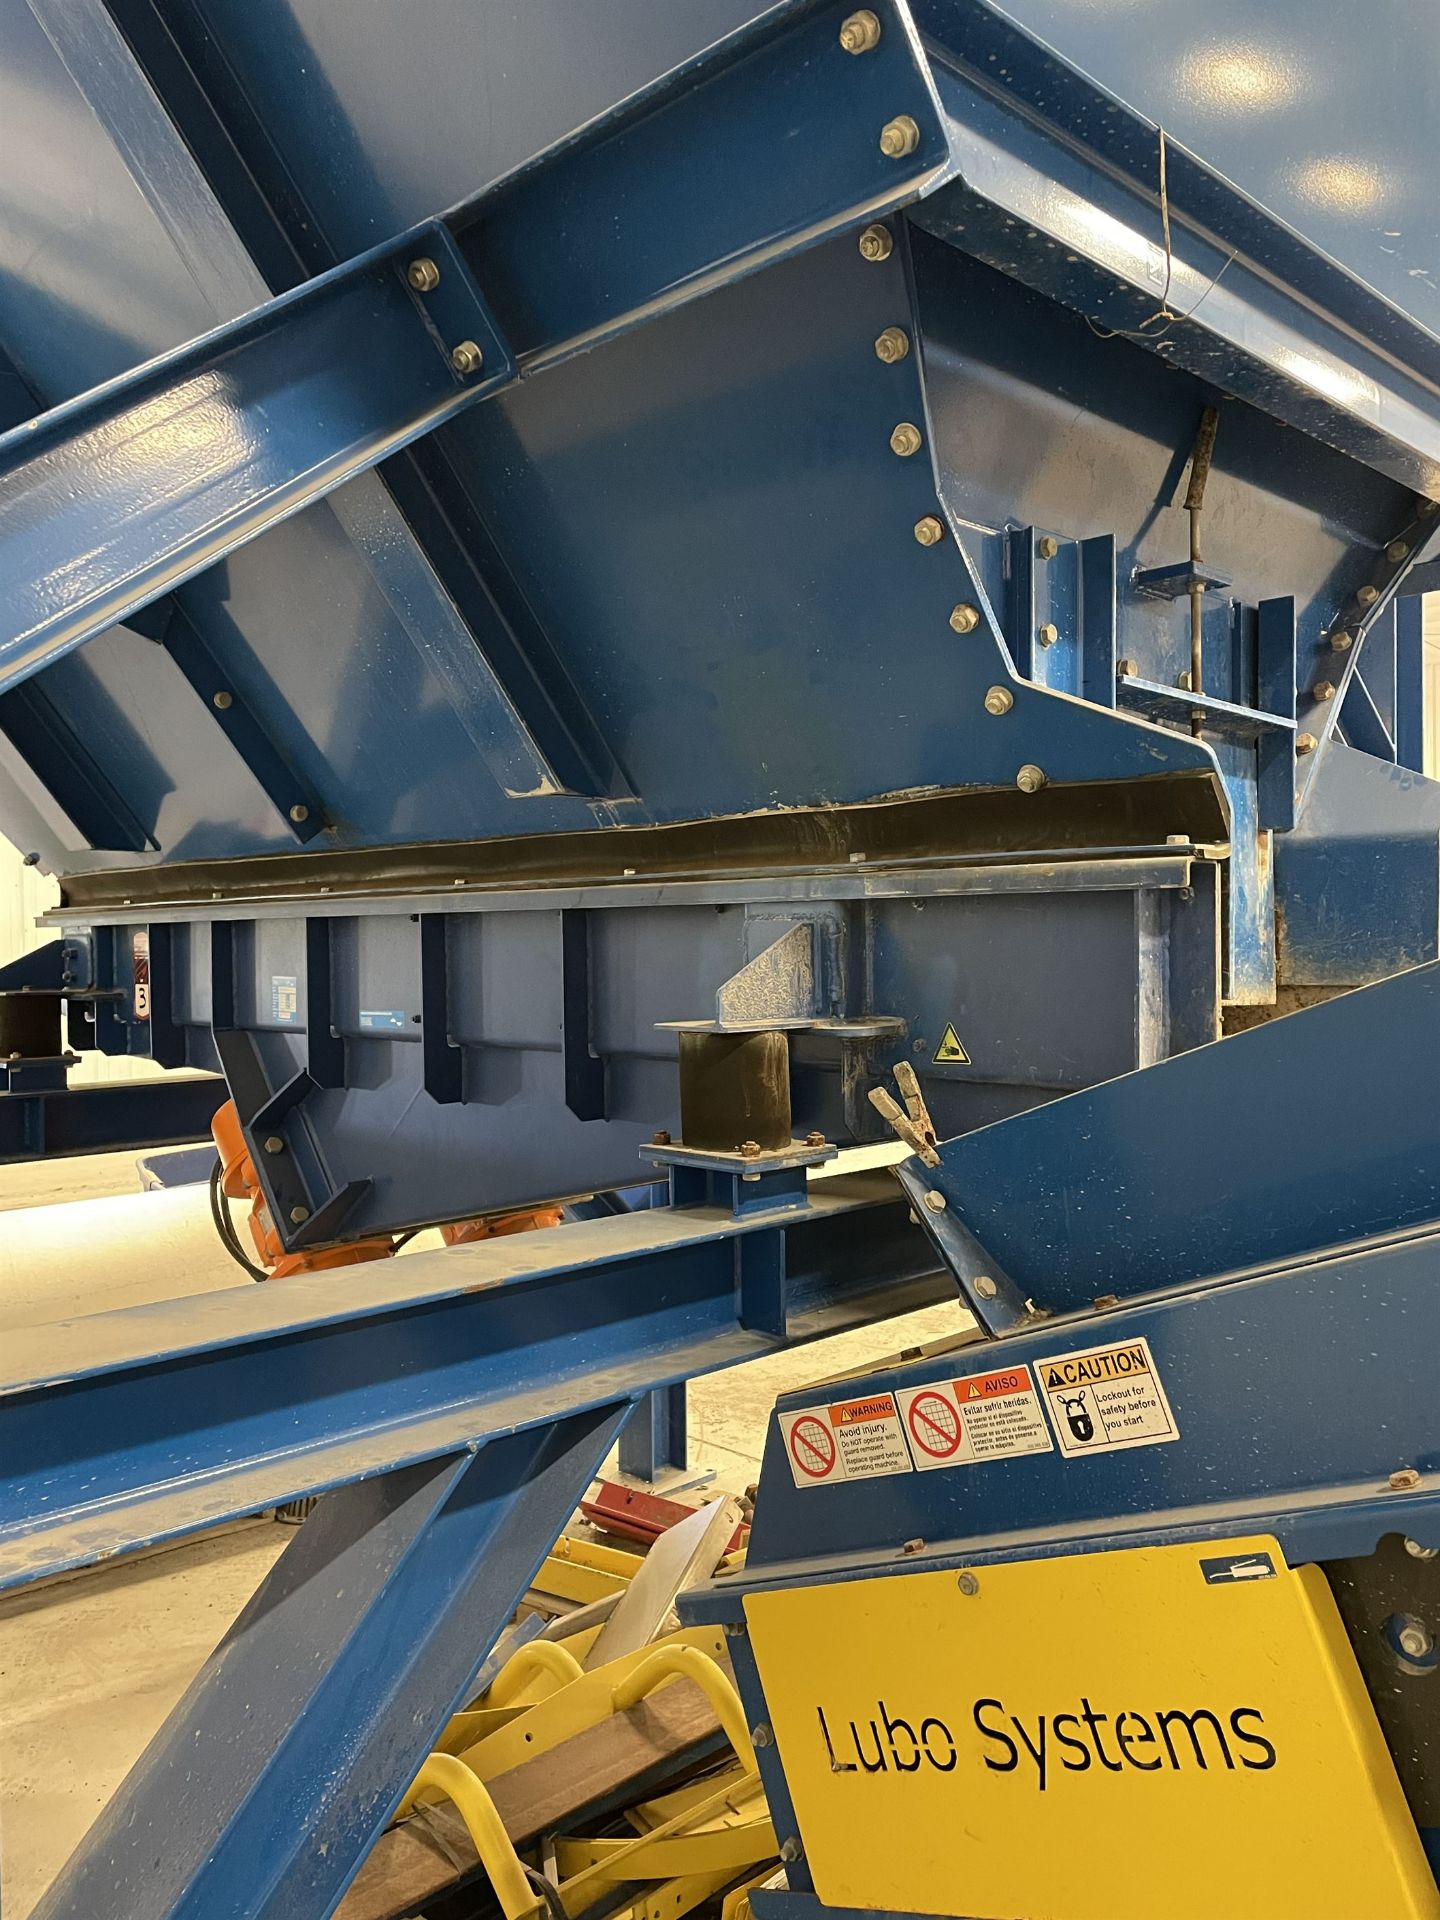 2015 SCREENING MACHINES HLOGO-60/300-25 Shaker Screen, s/n 1512A2186-2, 600 x 3000 x 250mm - Image 2 of 10